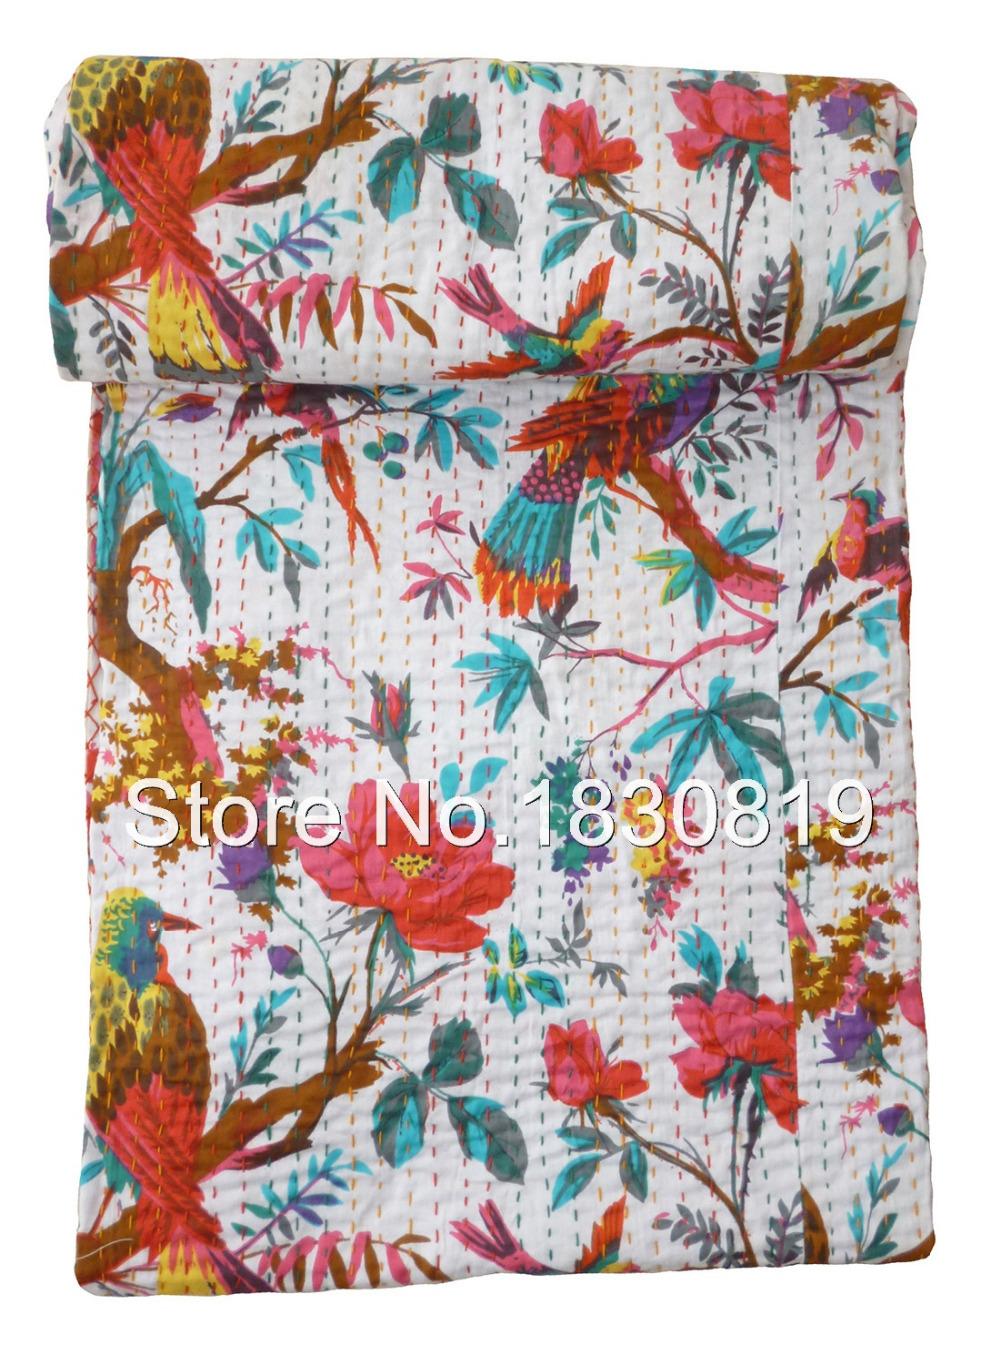 Indian Bird of Paradise Kantha Quilt, Bohemian Kantha Rallies, Reversible Bedsheet/Bedspread (KING Size, 100% Premium Quality).